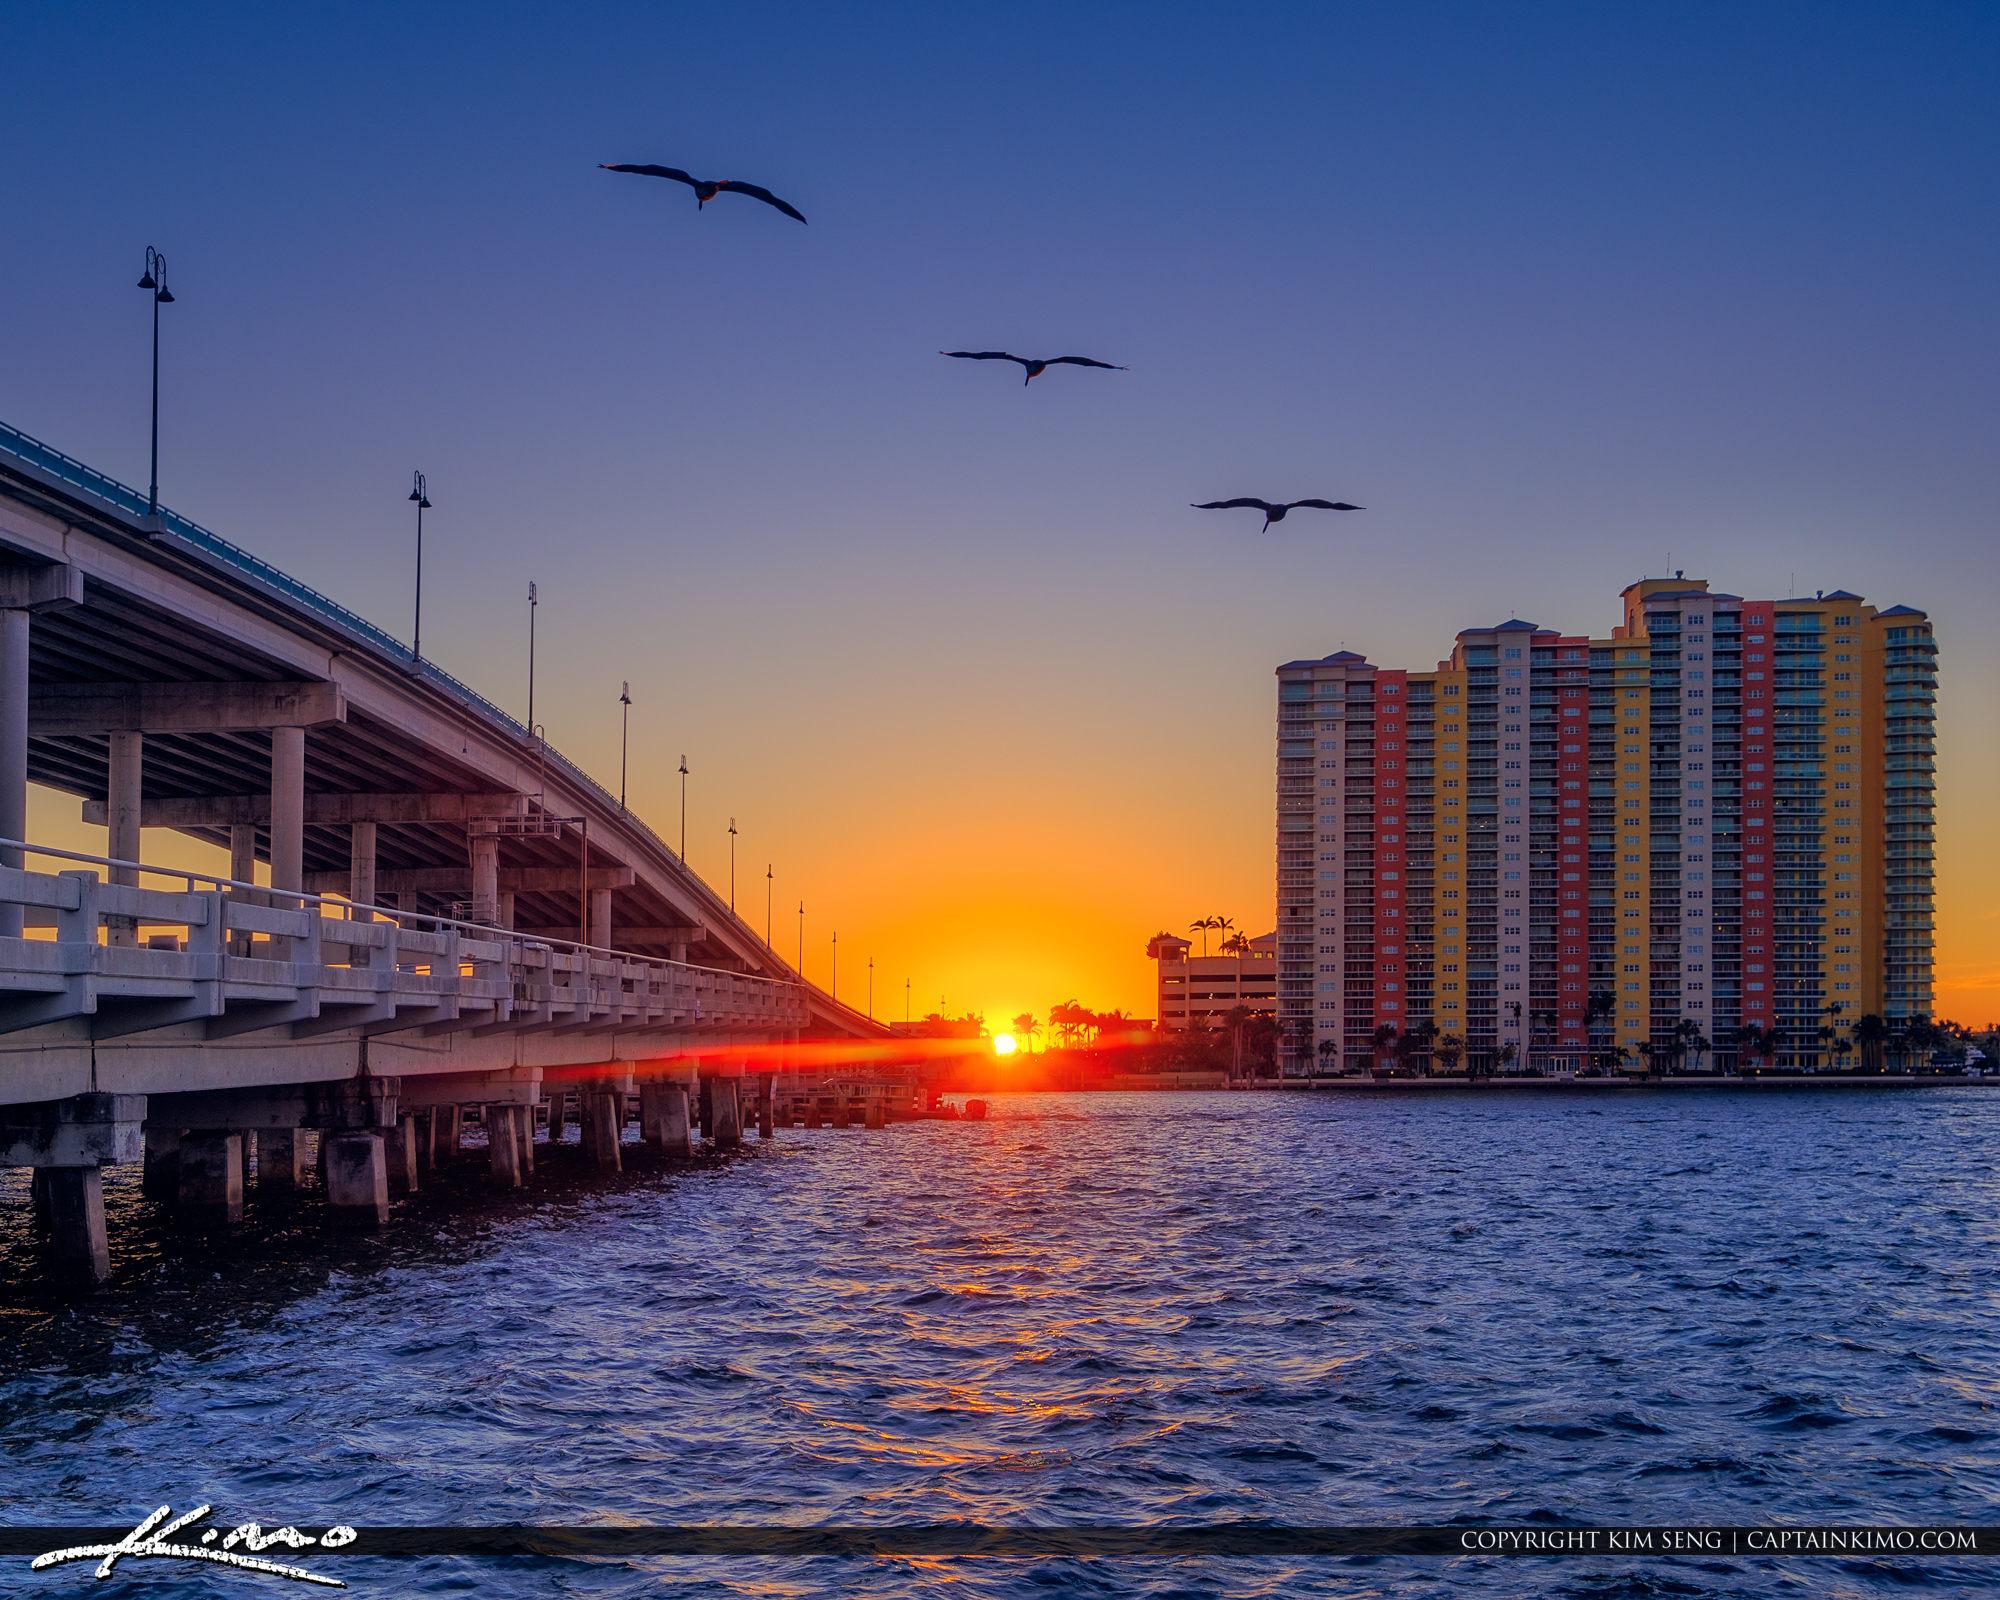 Phil Foster Park Singer Island Sunset Pelicans